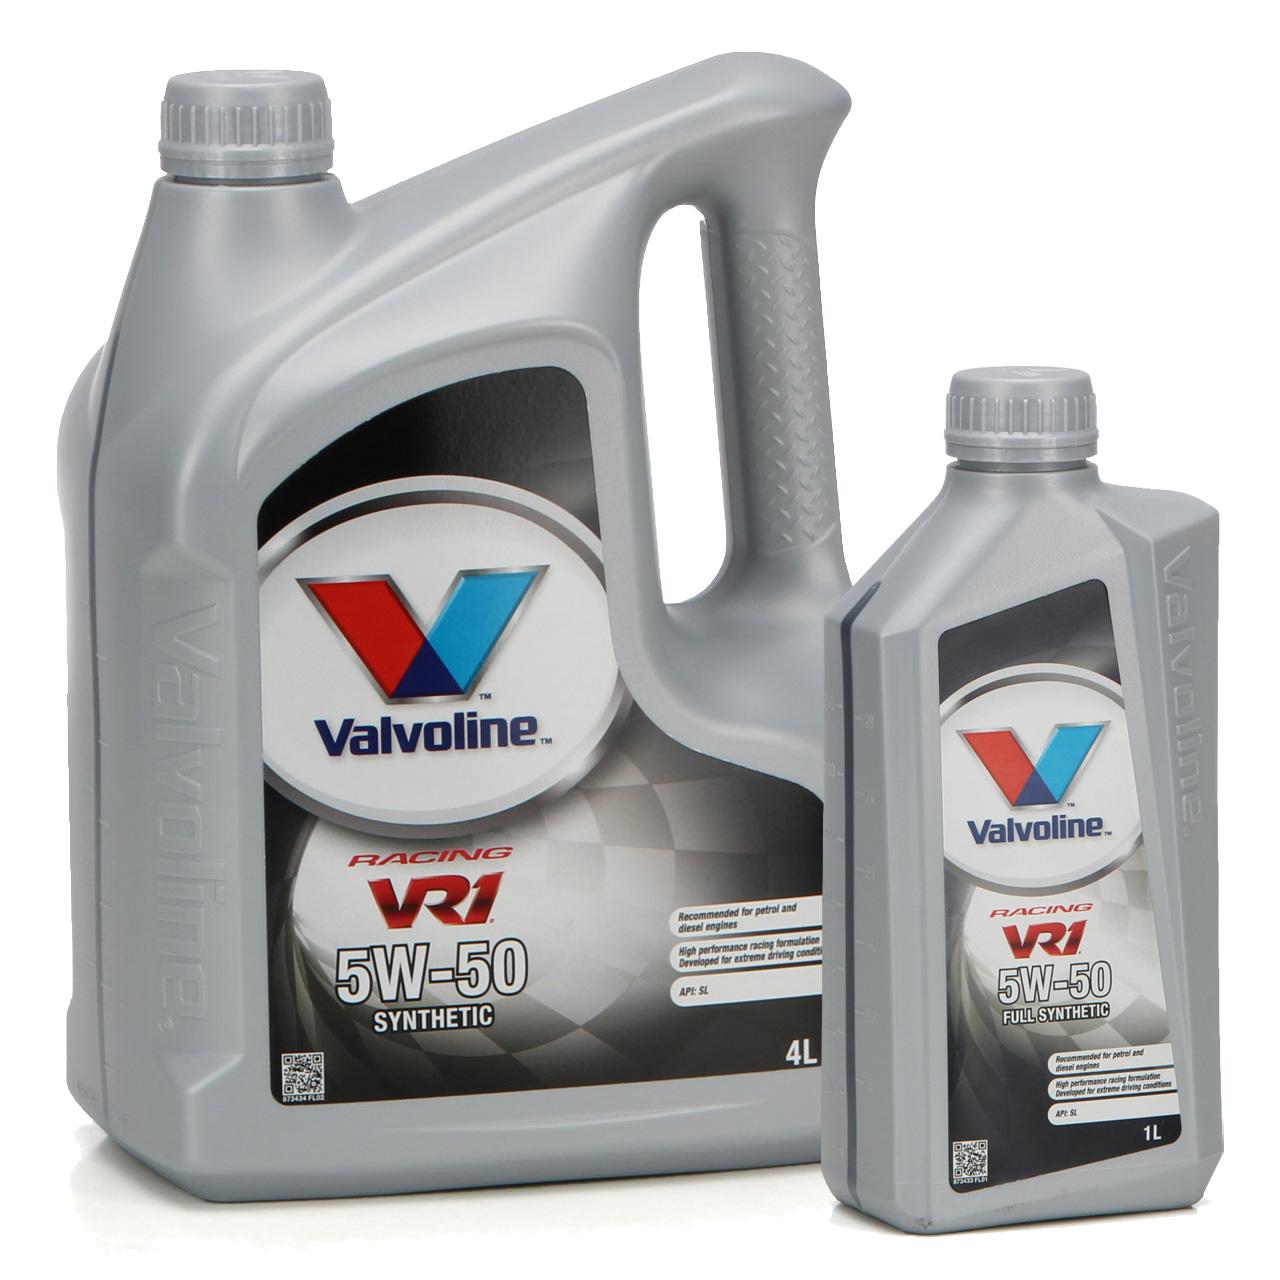 VALVOLINE Motoröl ÖL VR1 RACING 5W50 SM A3/B4 Ford M2C-153E GM 6094M - 5 Liter